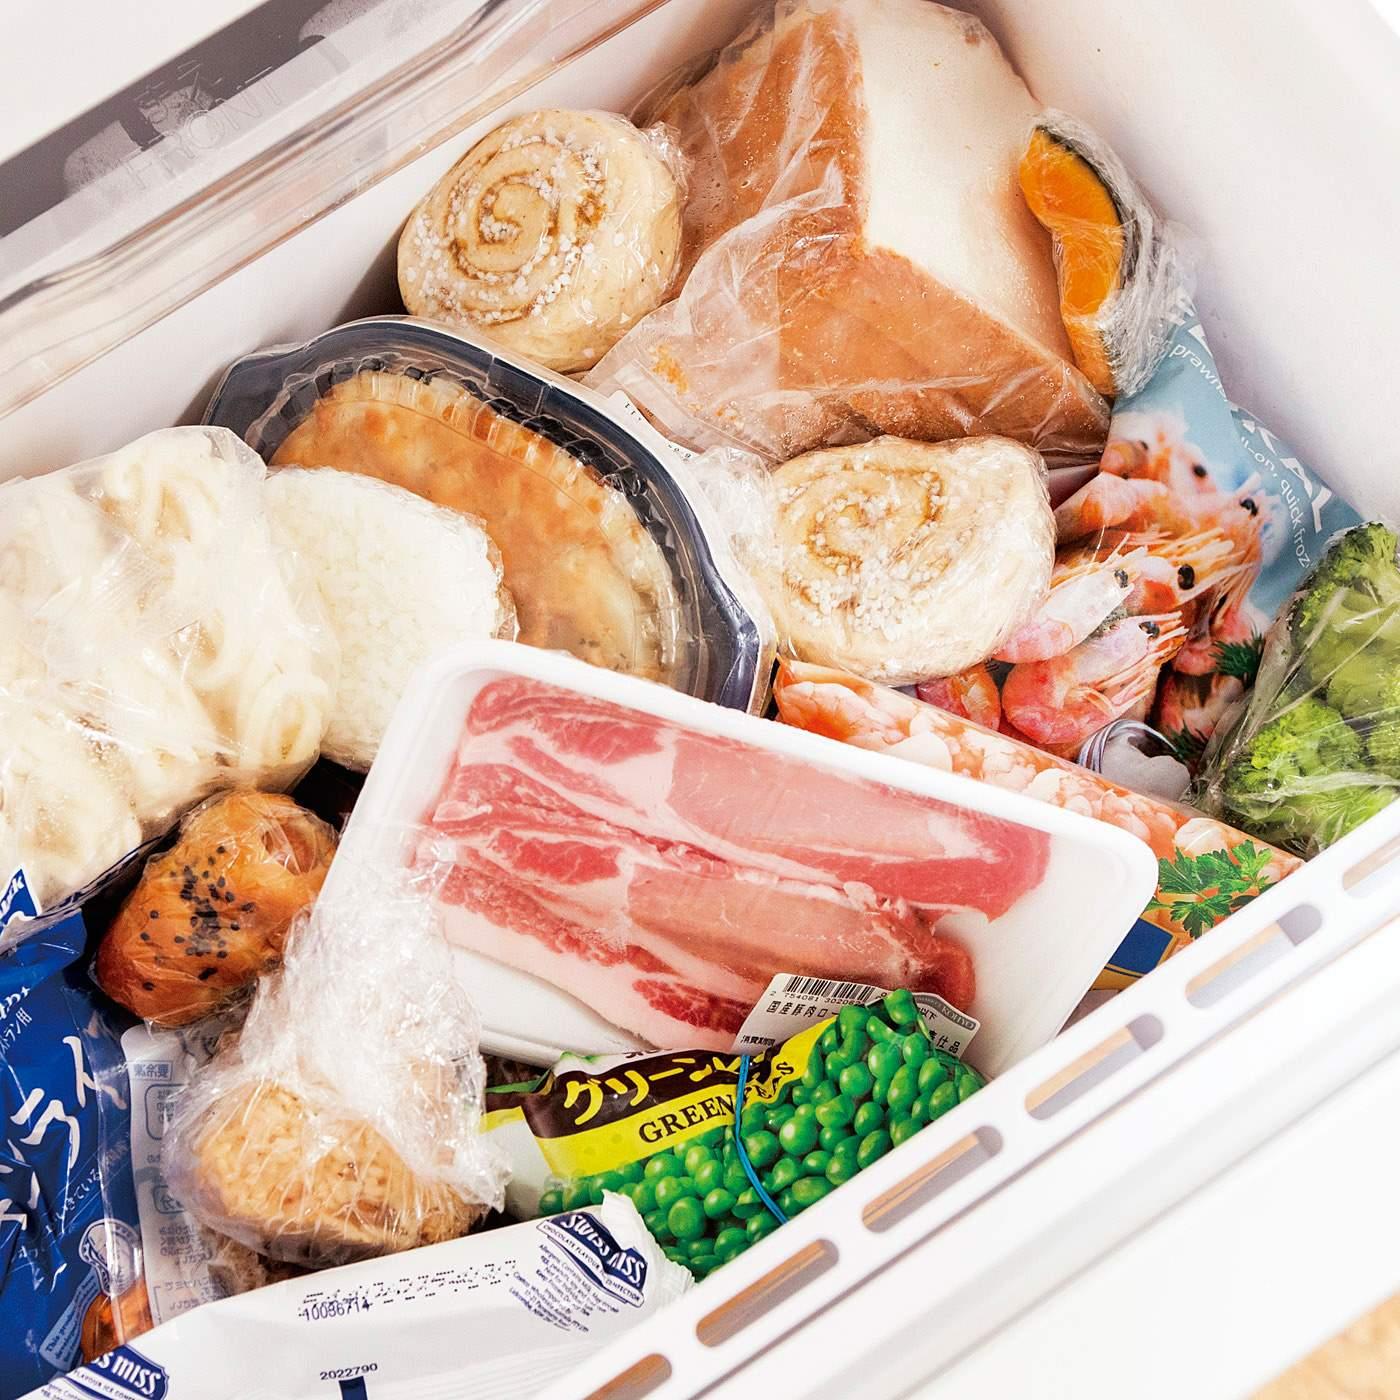 BEFORE 買い置き食材の使い残し、迷子続出!